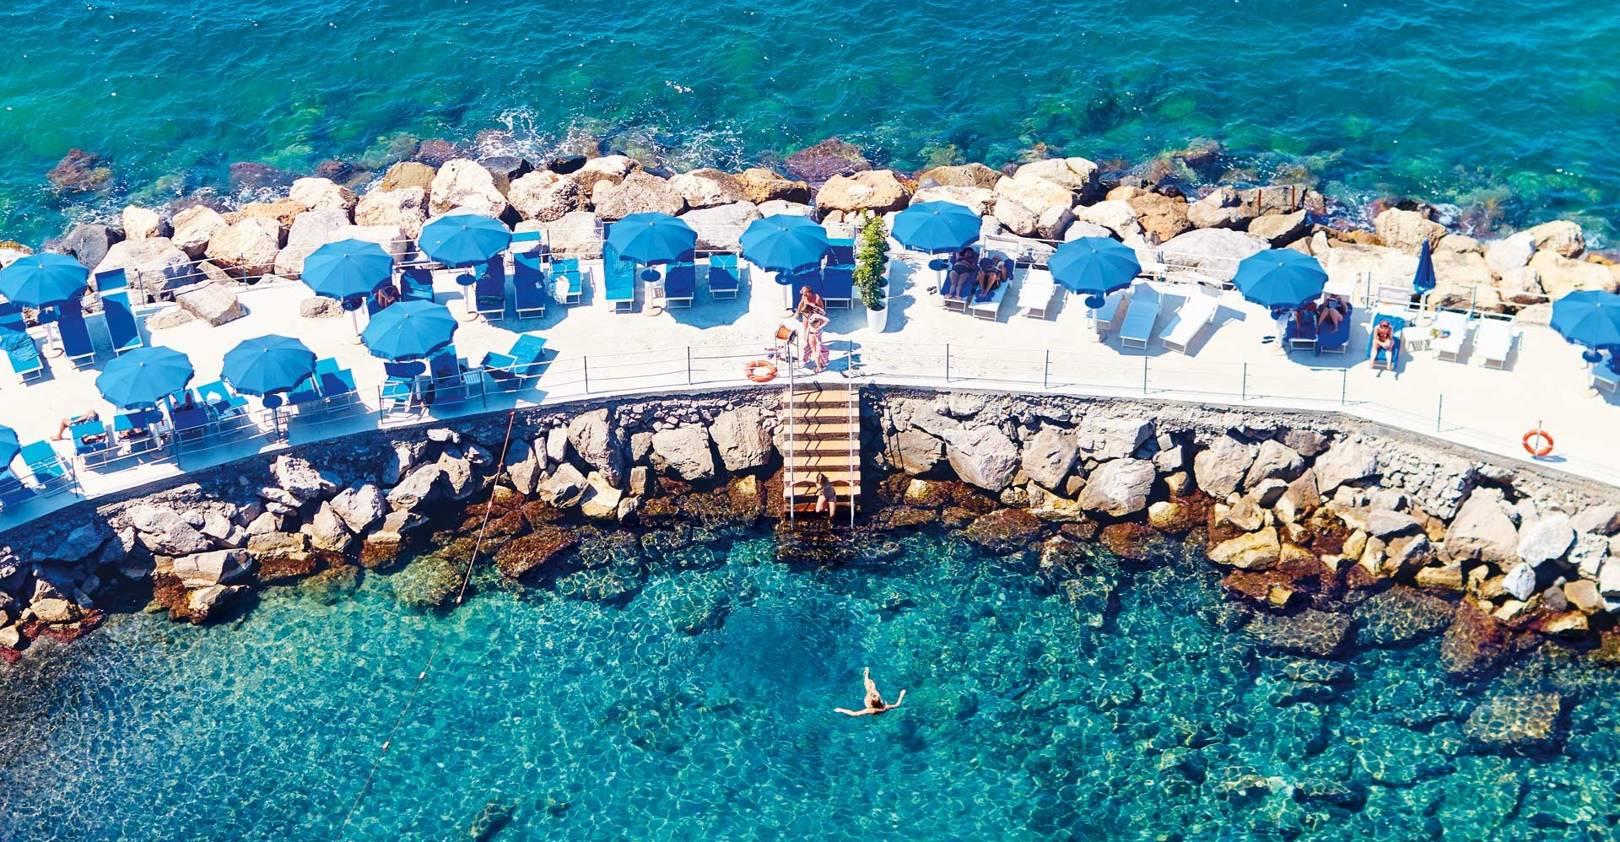 Travel Guide To Amalfi Coast